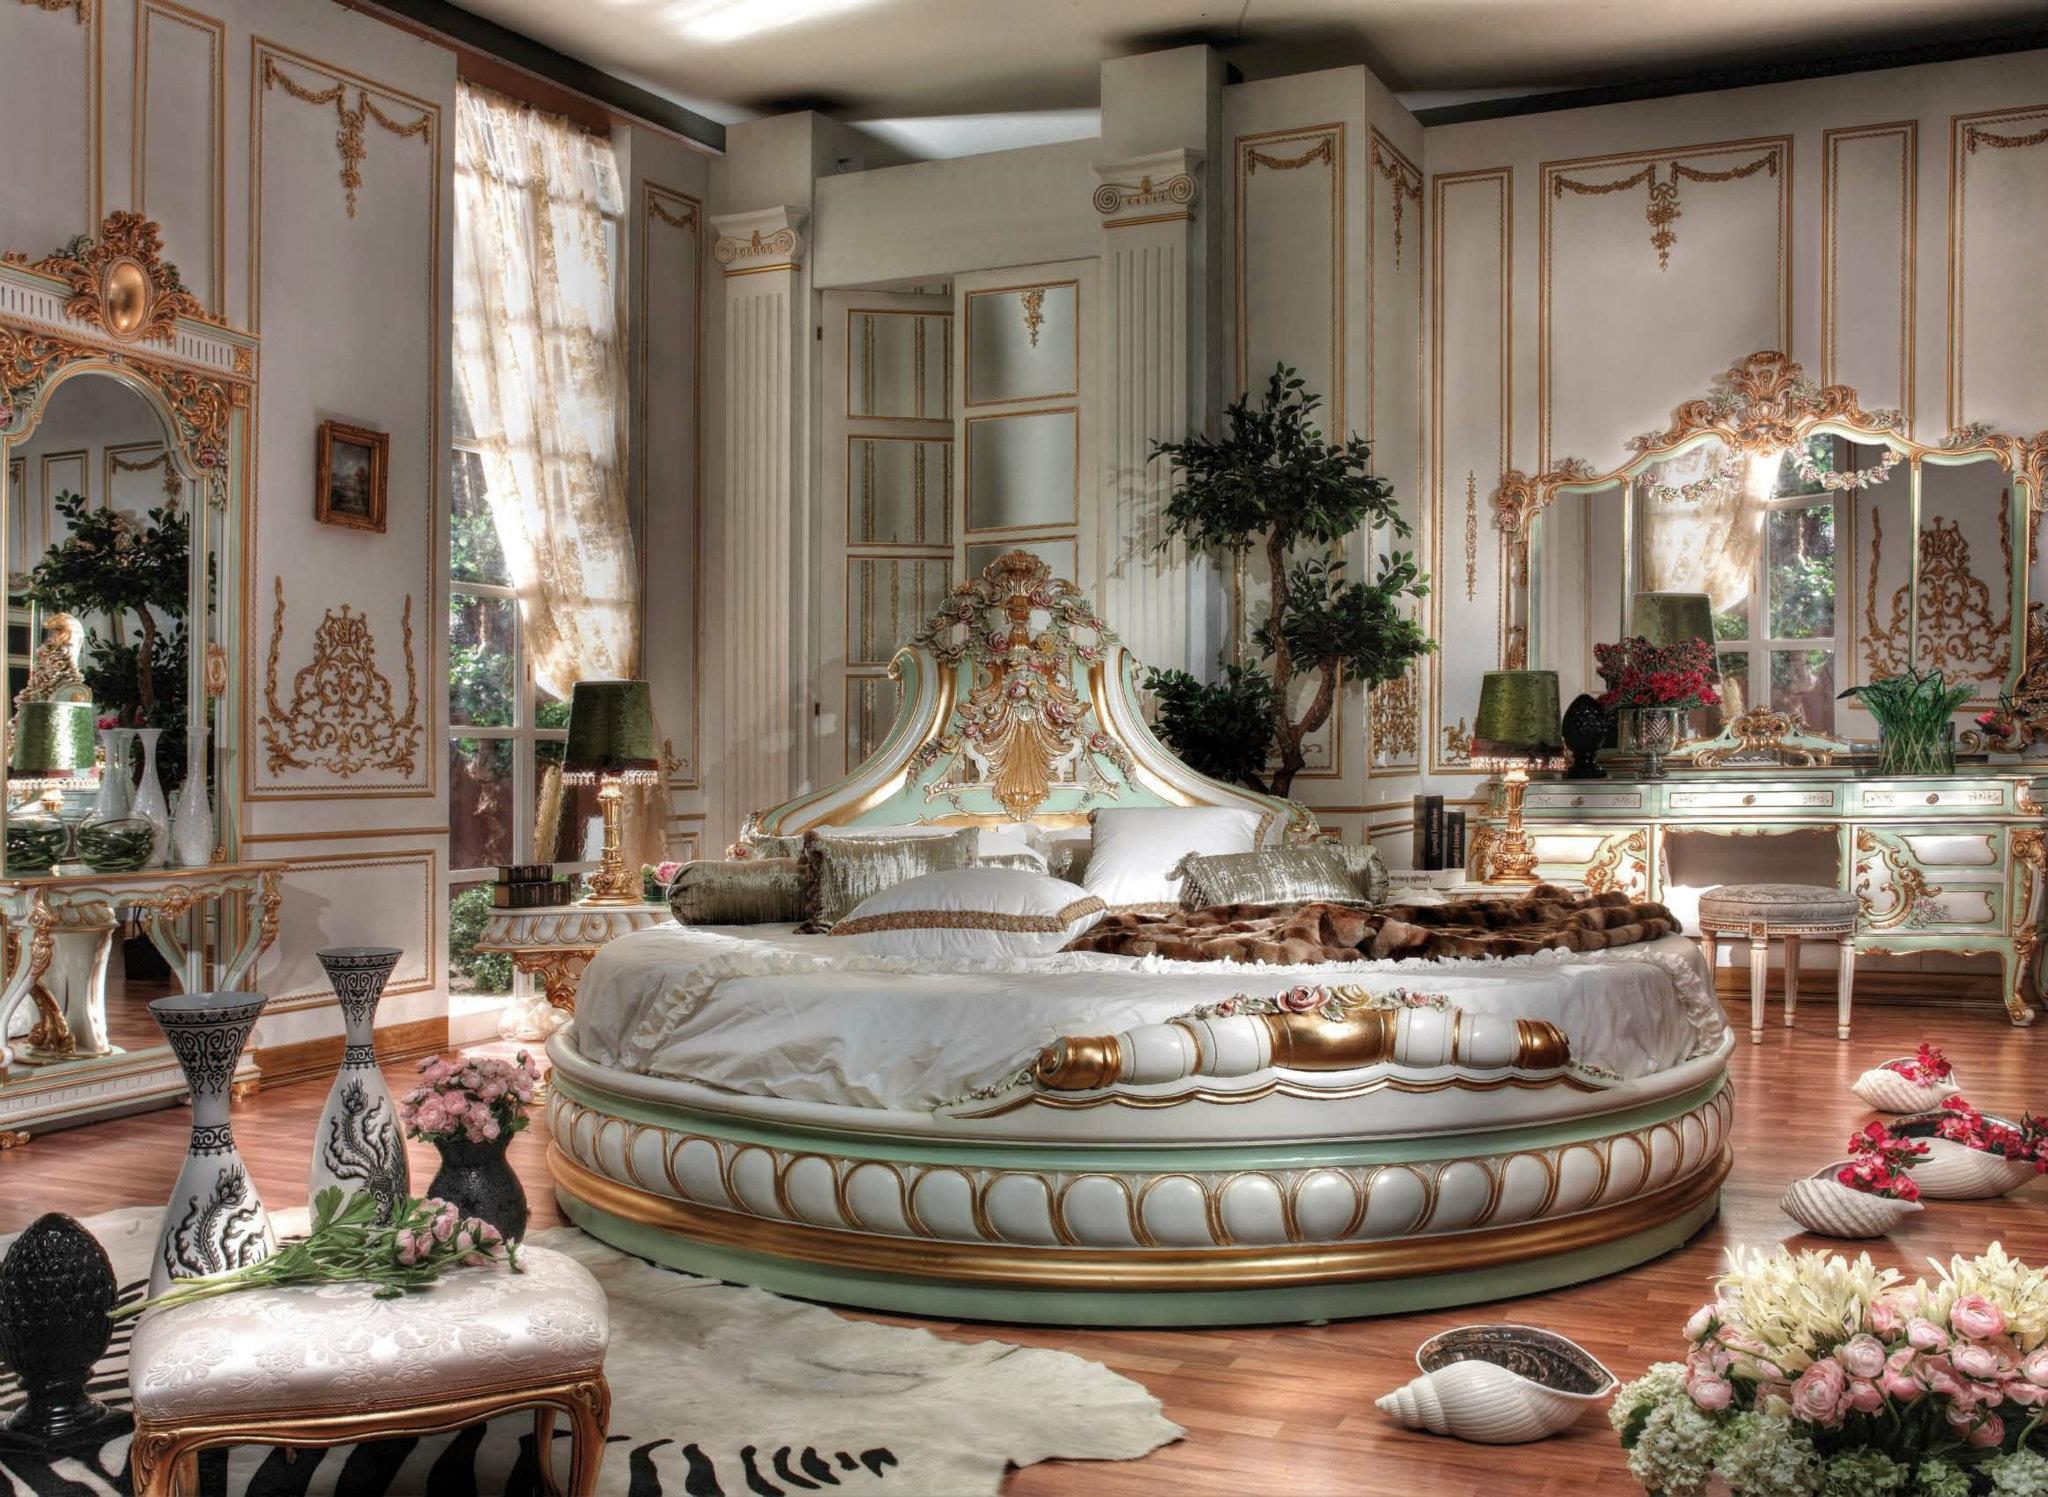 wonderful italian style bedroom design | » Italian Bed Room in Round ShapeTop and Best Italian ...